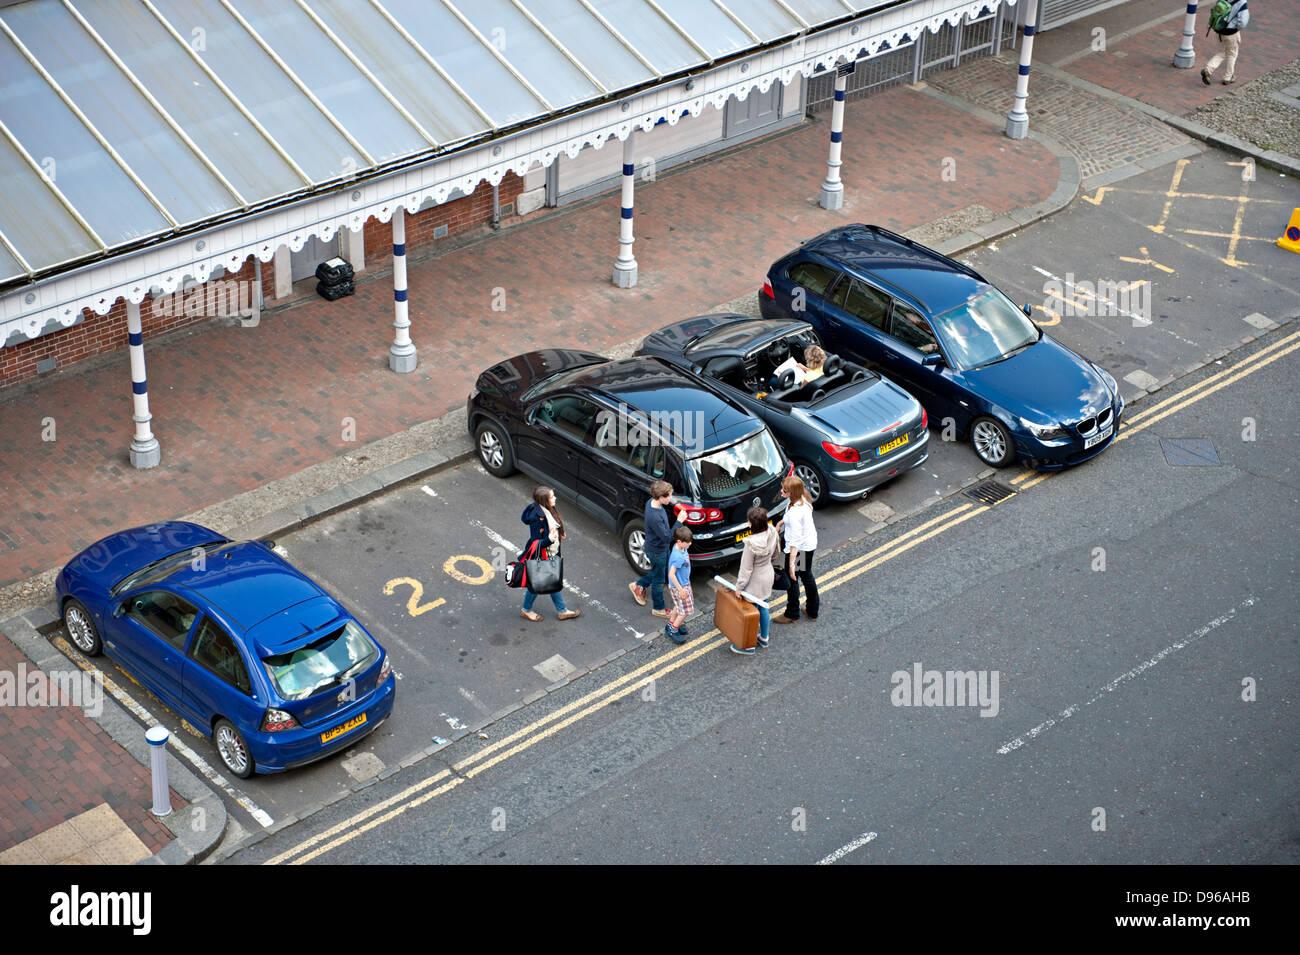 Car parking outside Tunbridge Wells Railway Station, Kent, UK - Stock Image